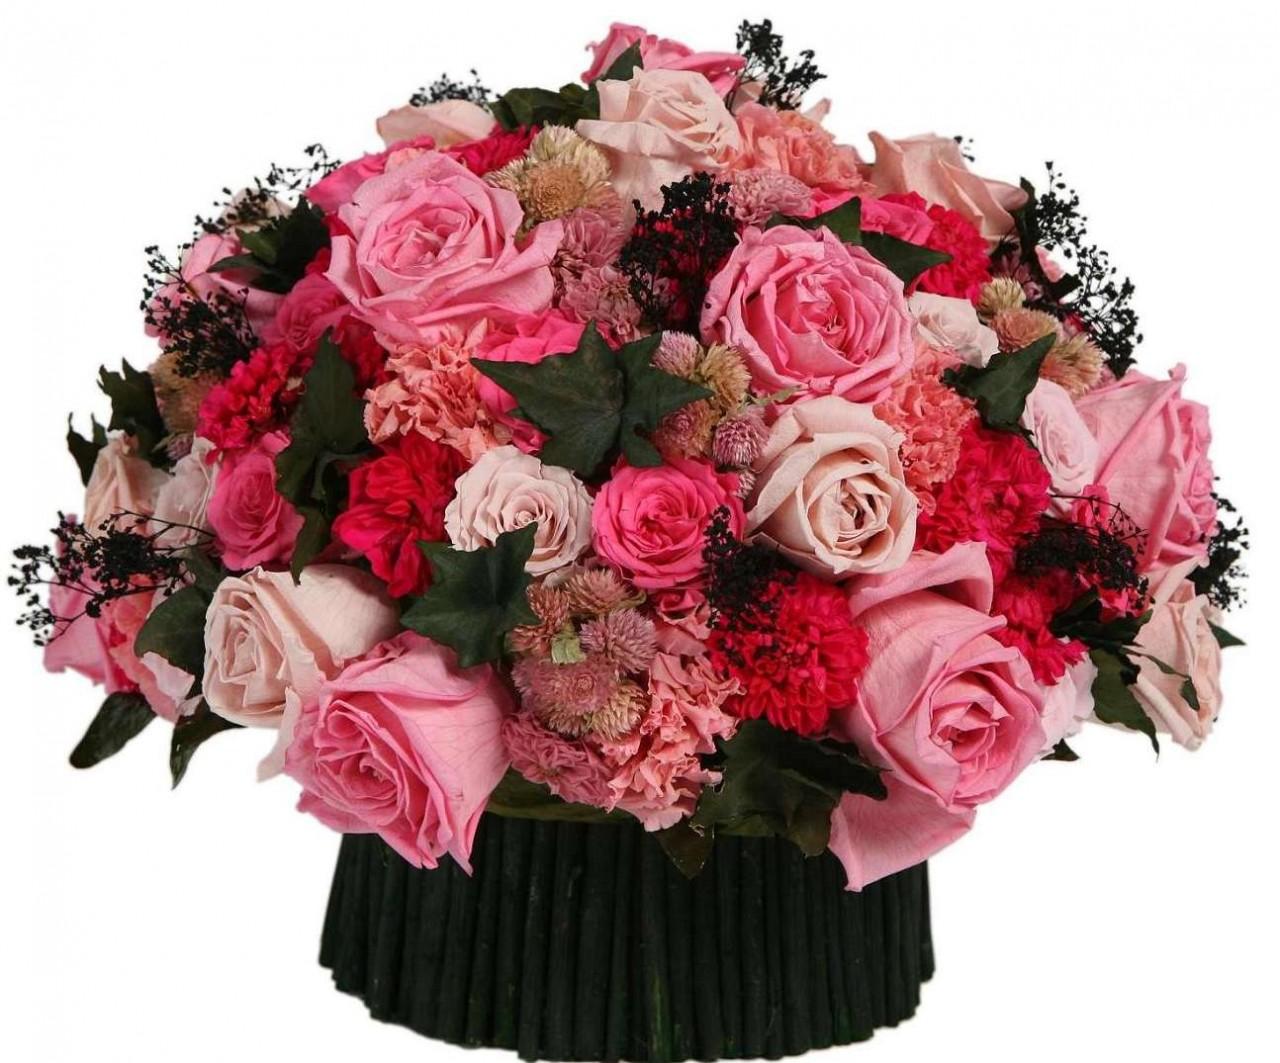 Фото букеты цветов с днем